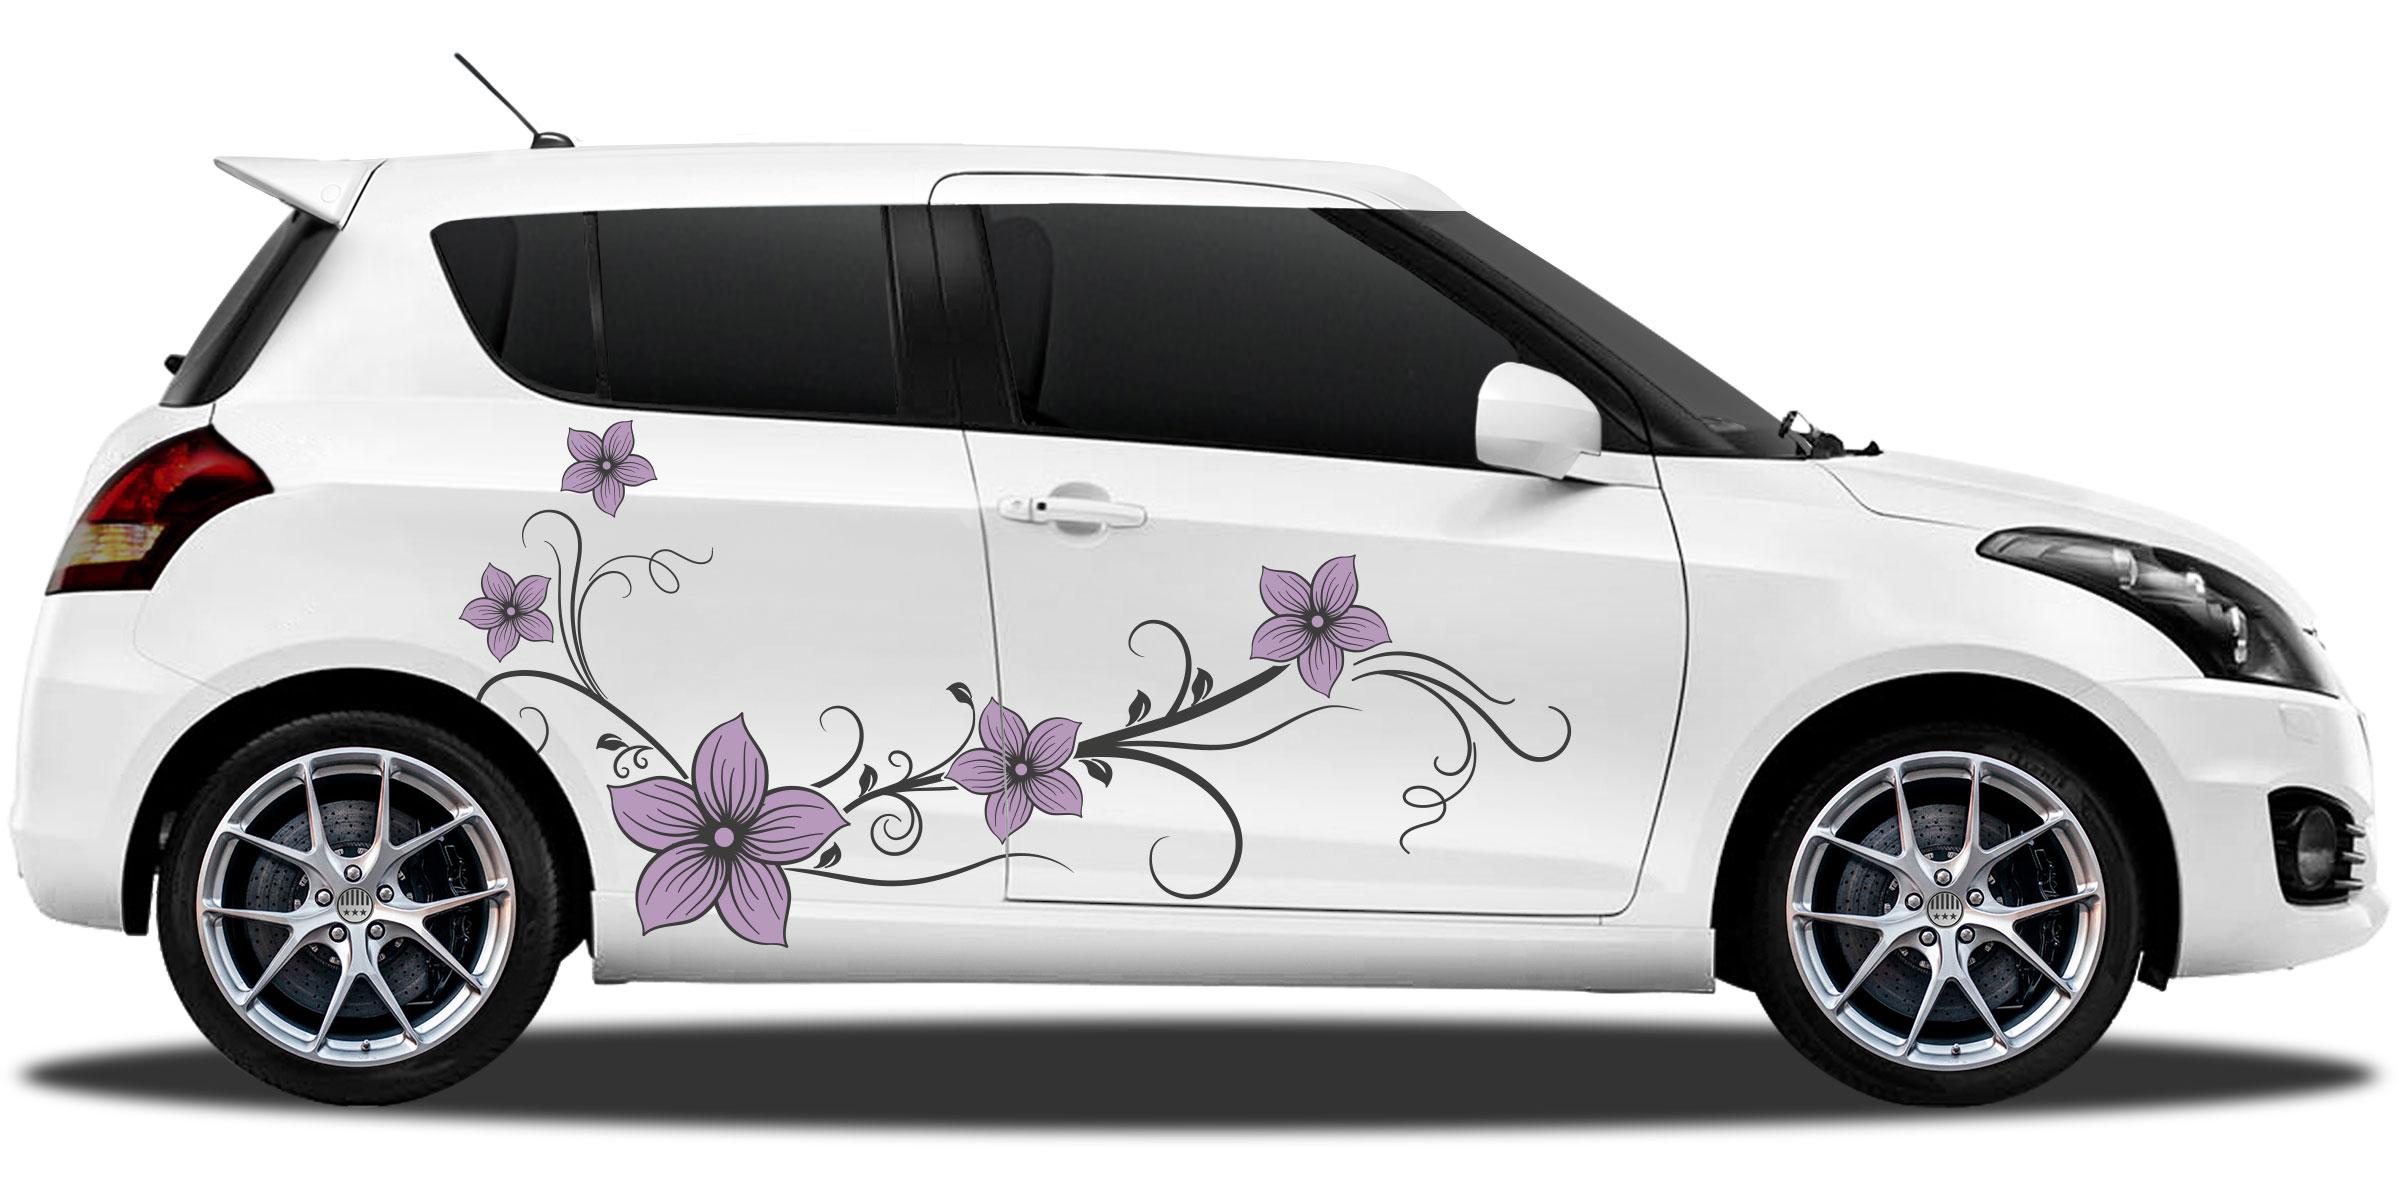 Autoaufkleber Blumenranke In Mehrfarbig